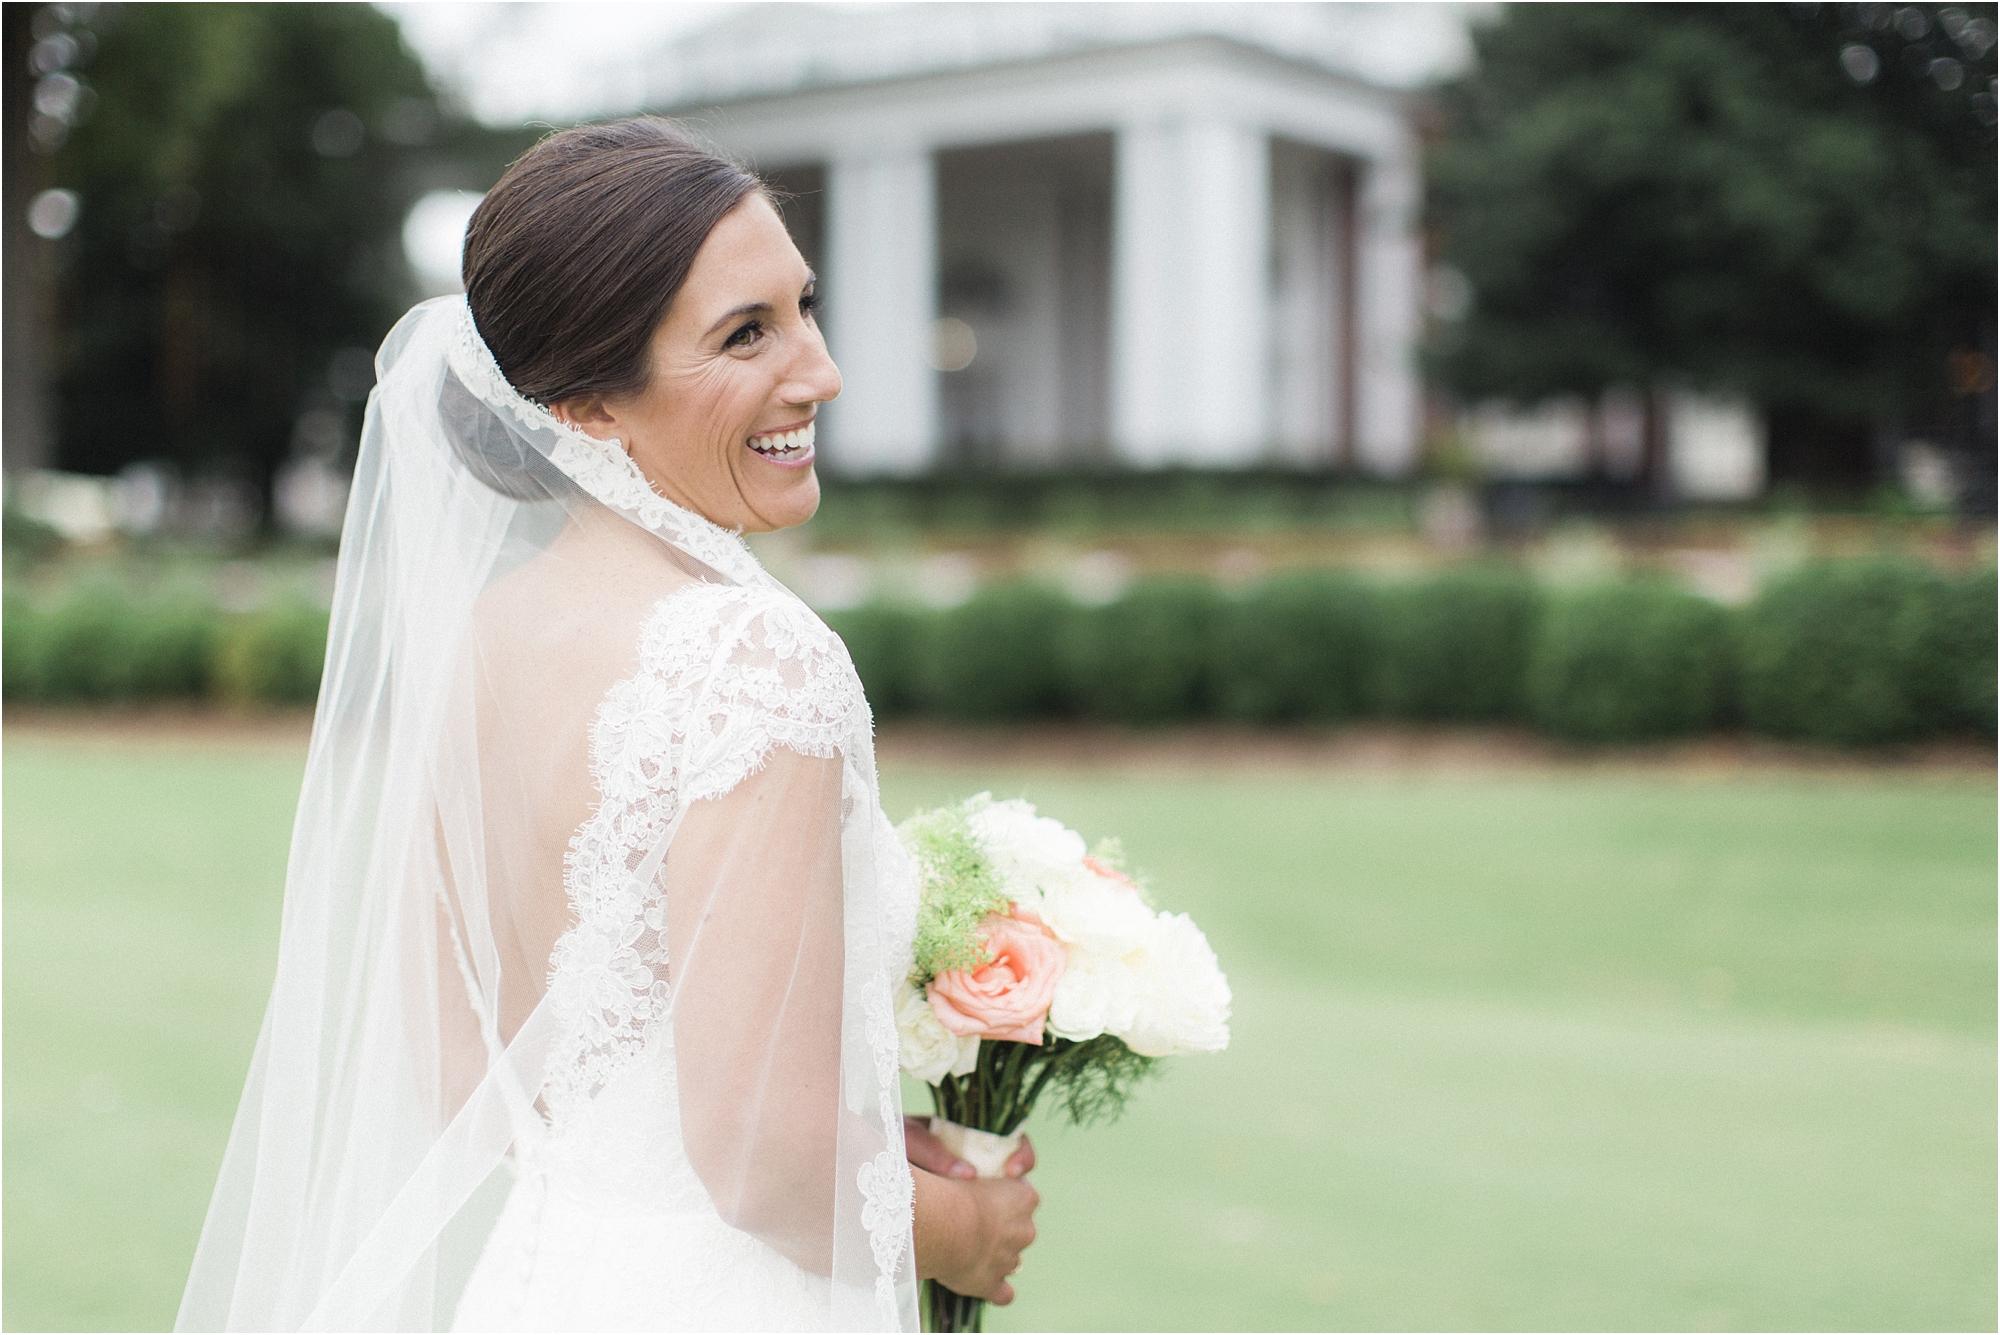 stephanie-yonce-photography-richmond-virginia-country-club-wedding-photo_017.JPG